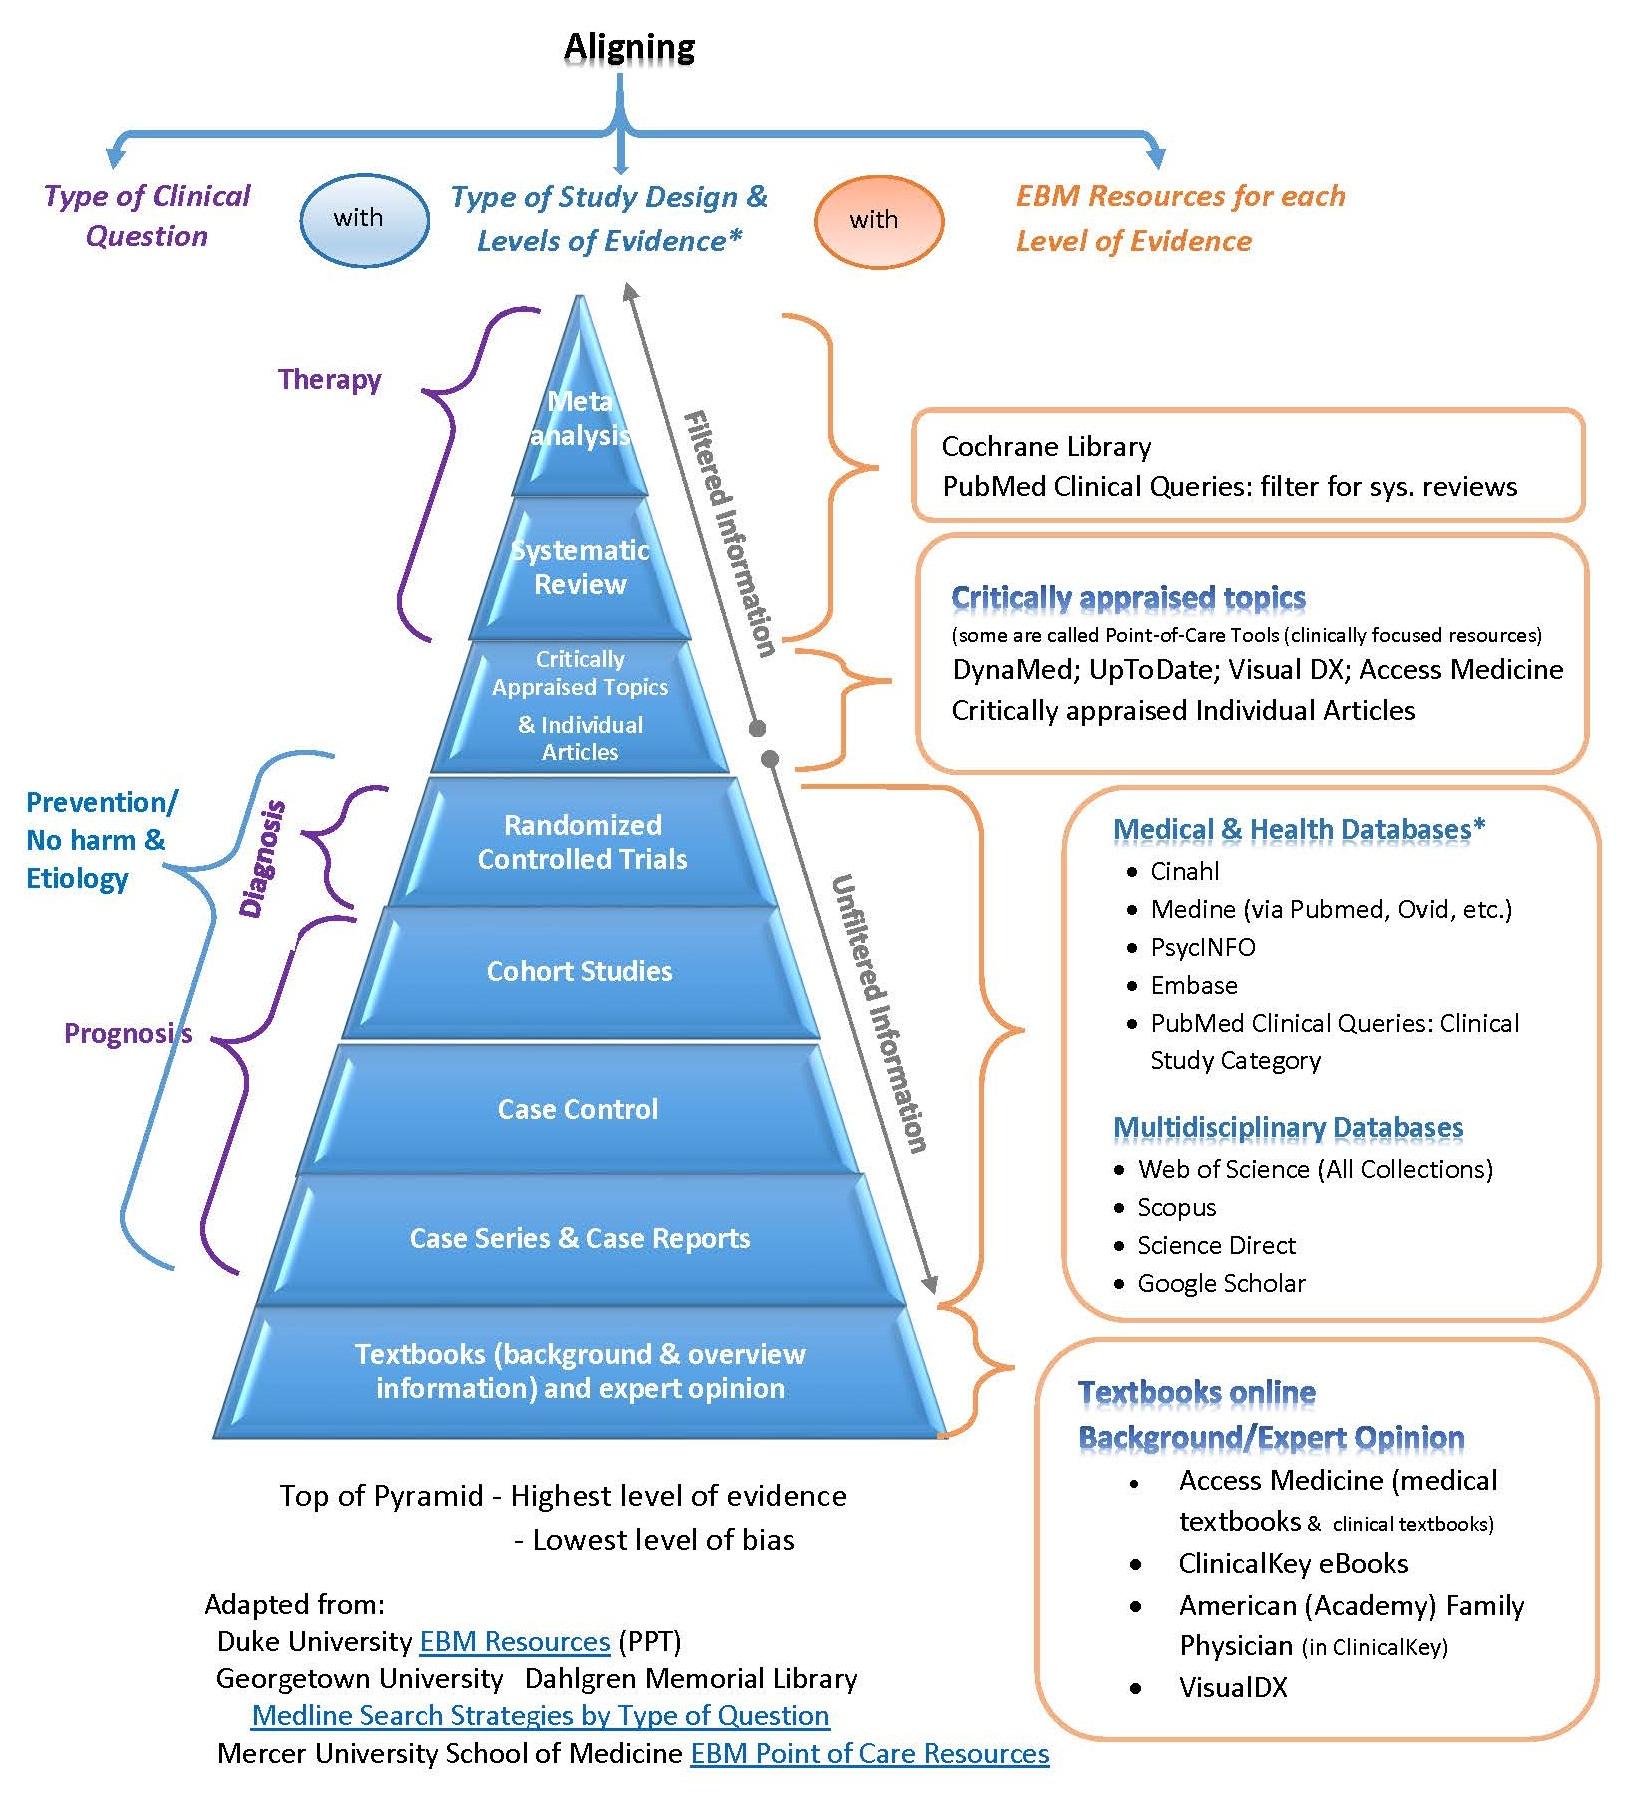 ... highest level of evidence. ebm align pyramid.jpg 807b2eb73ea85